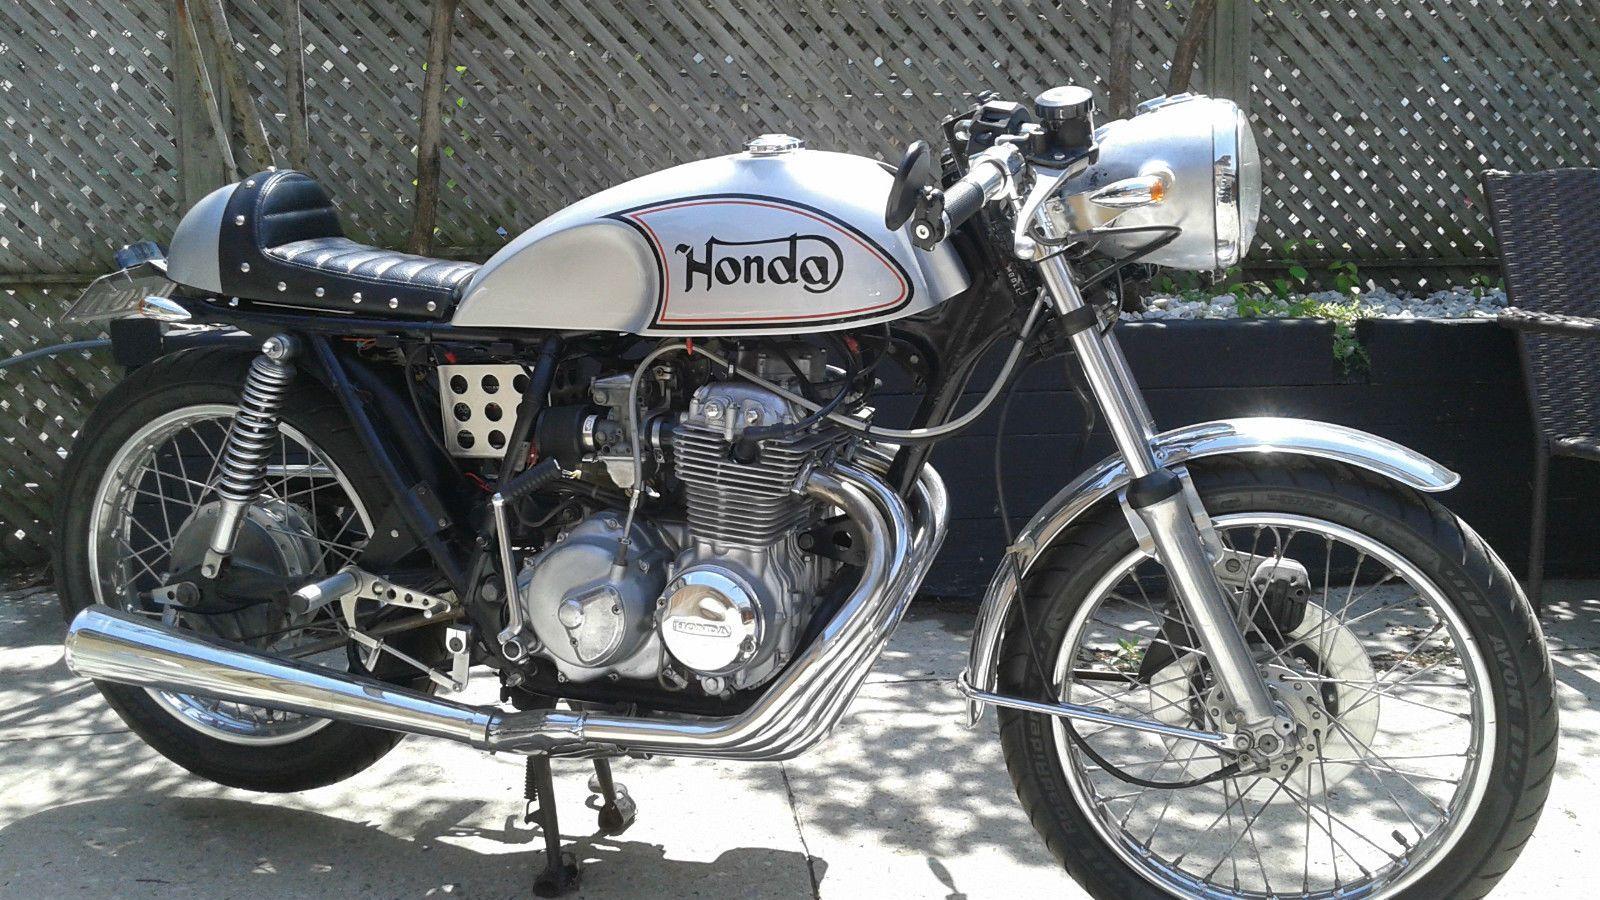 honda cb400f for sale - HD1600×900